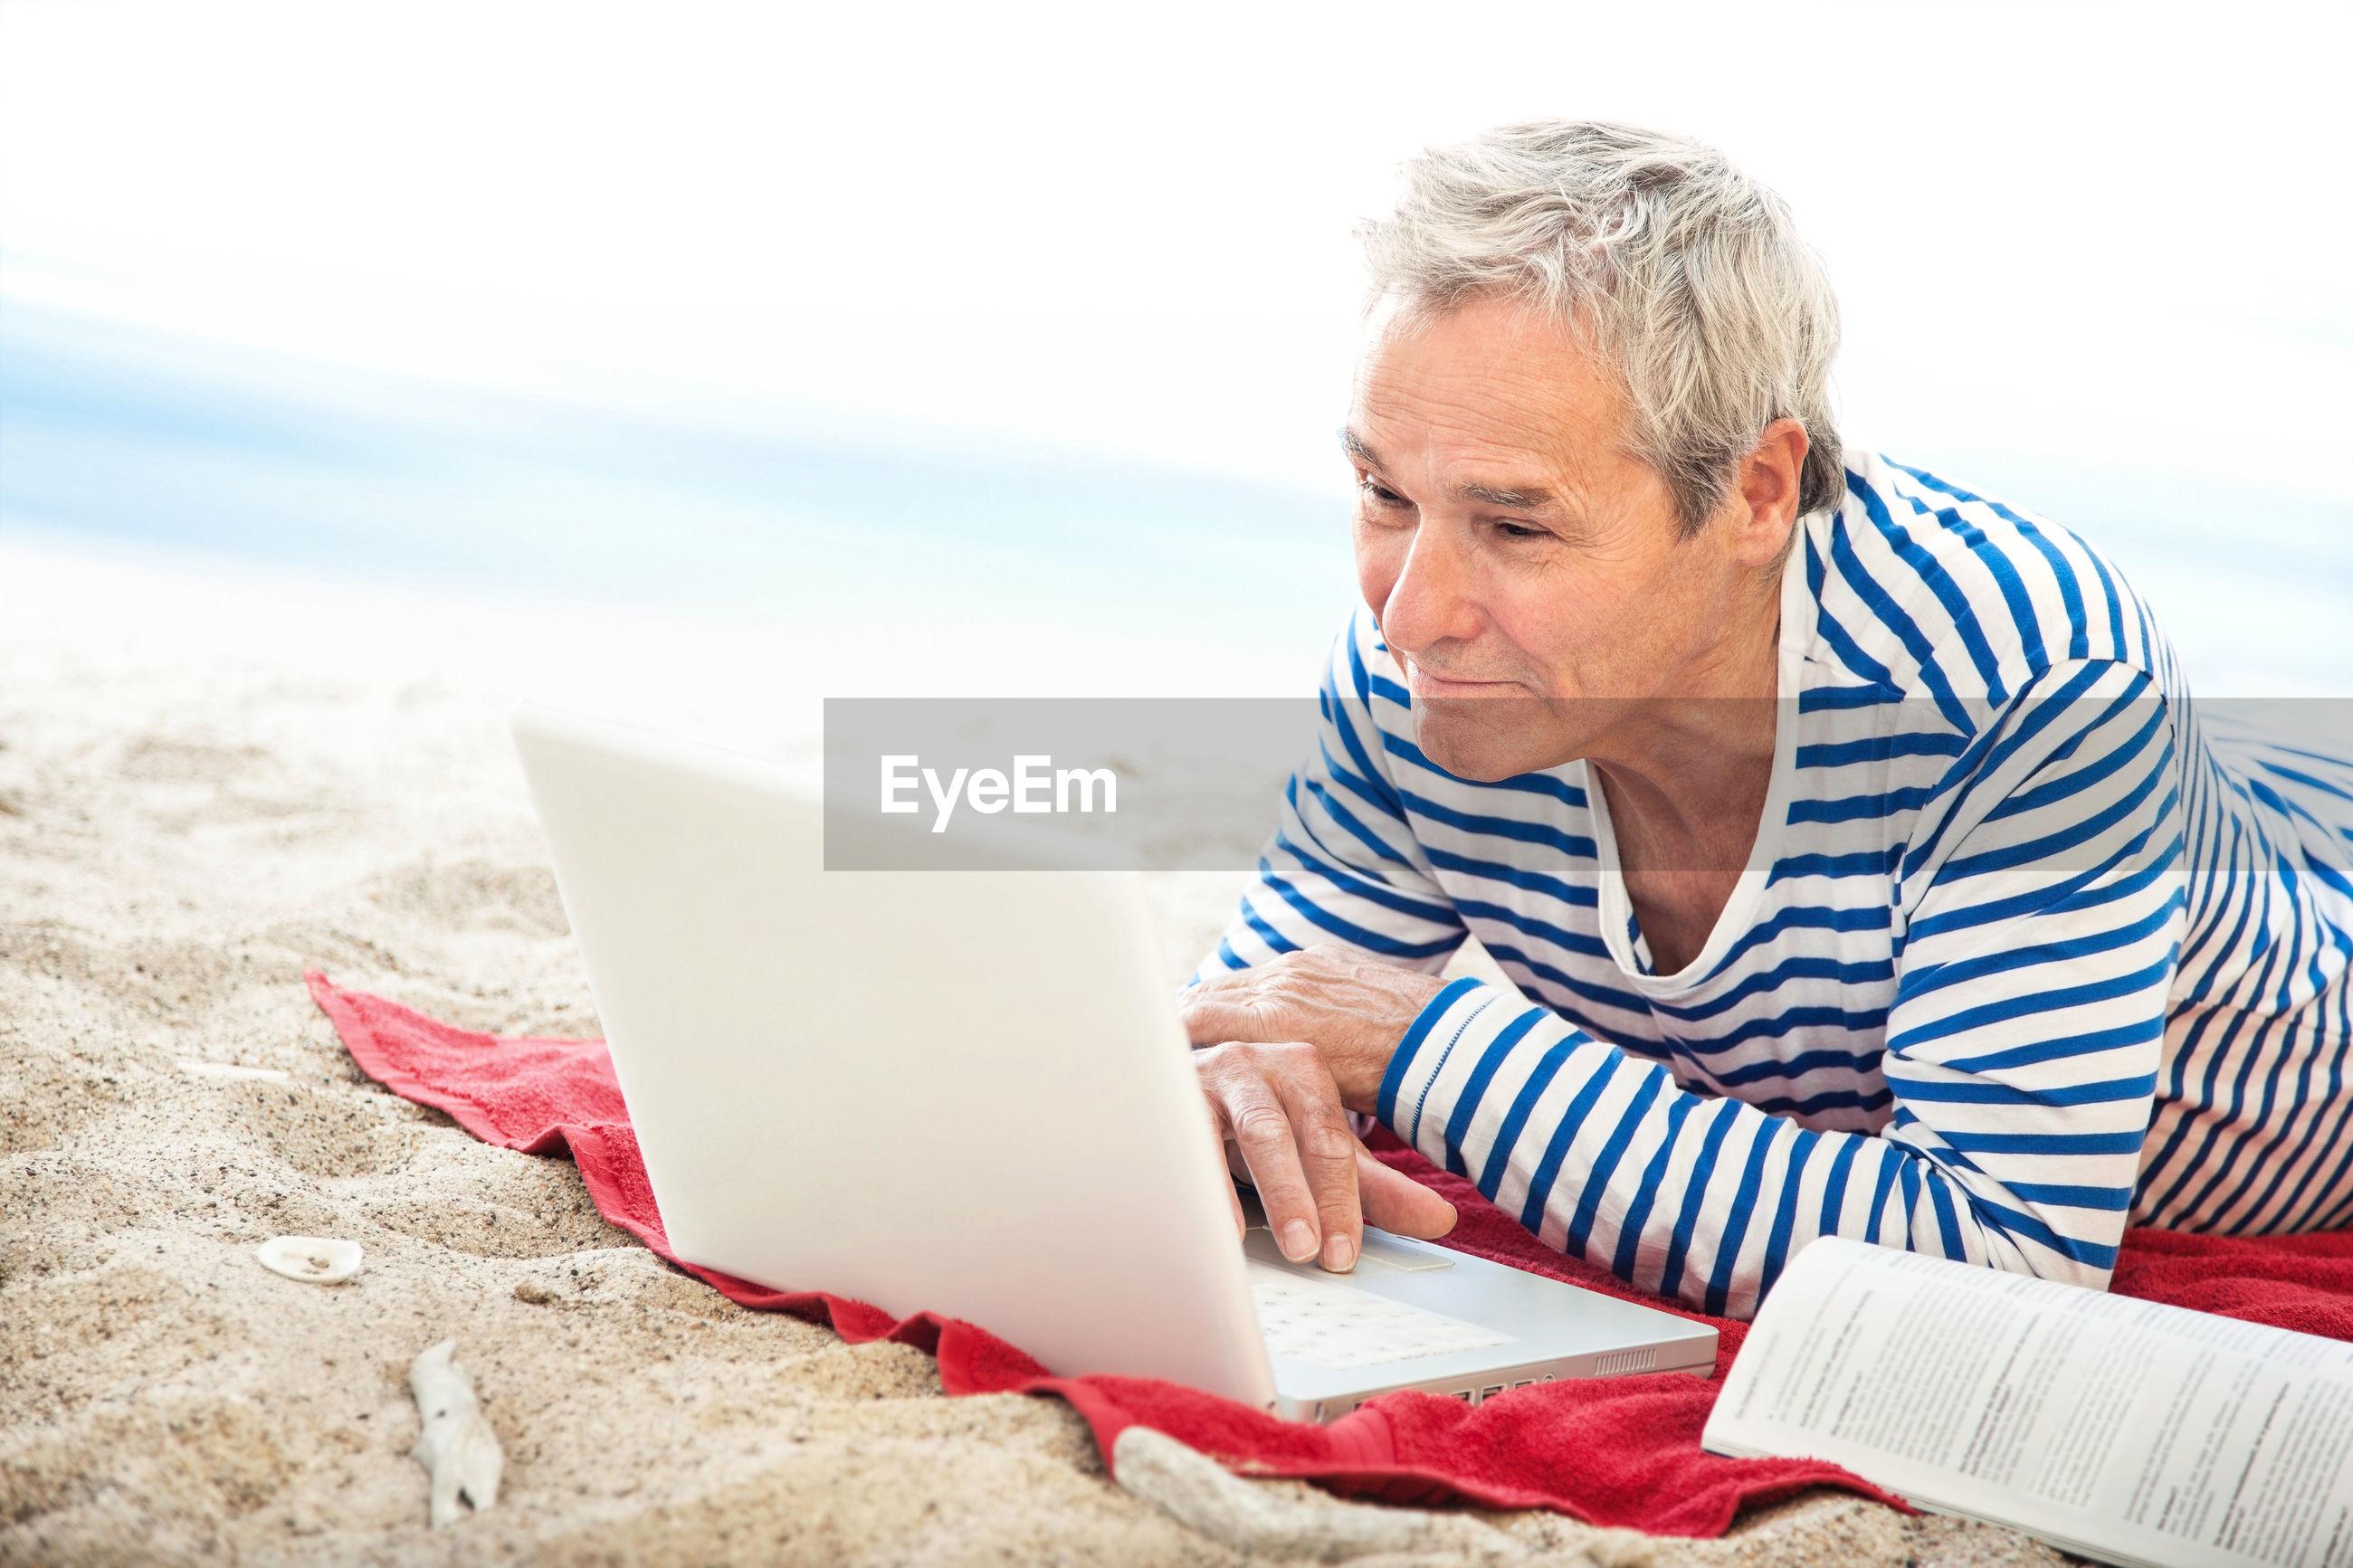 Man using laptop at beach against sky